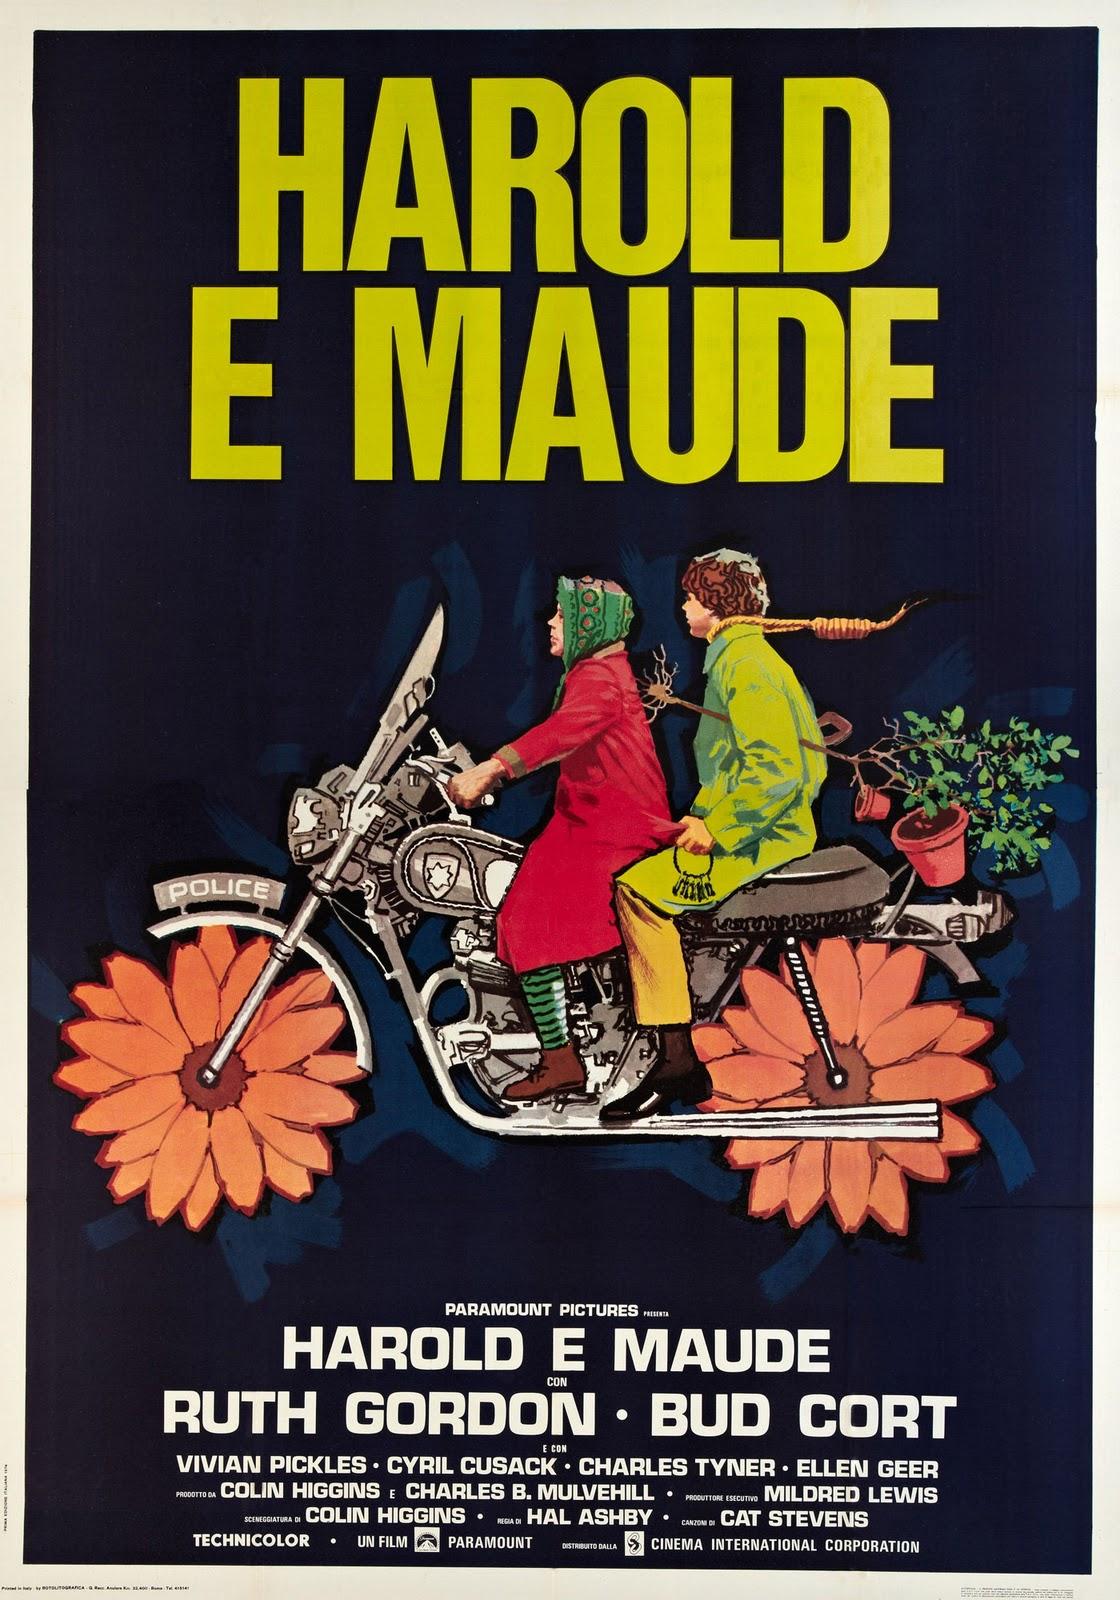 Harold e Maude - Film (1971) - ComingSoon.it